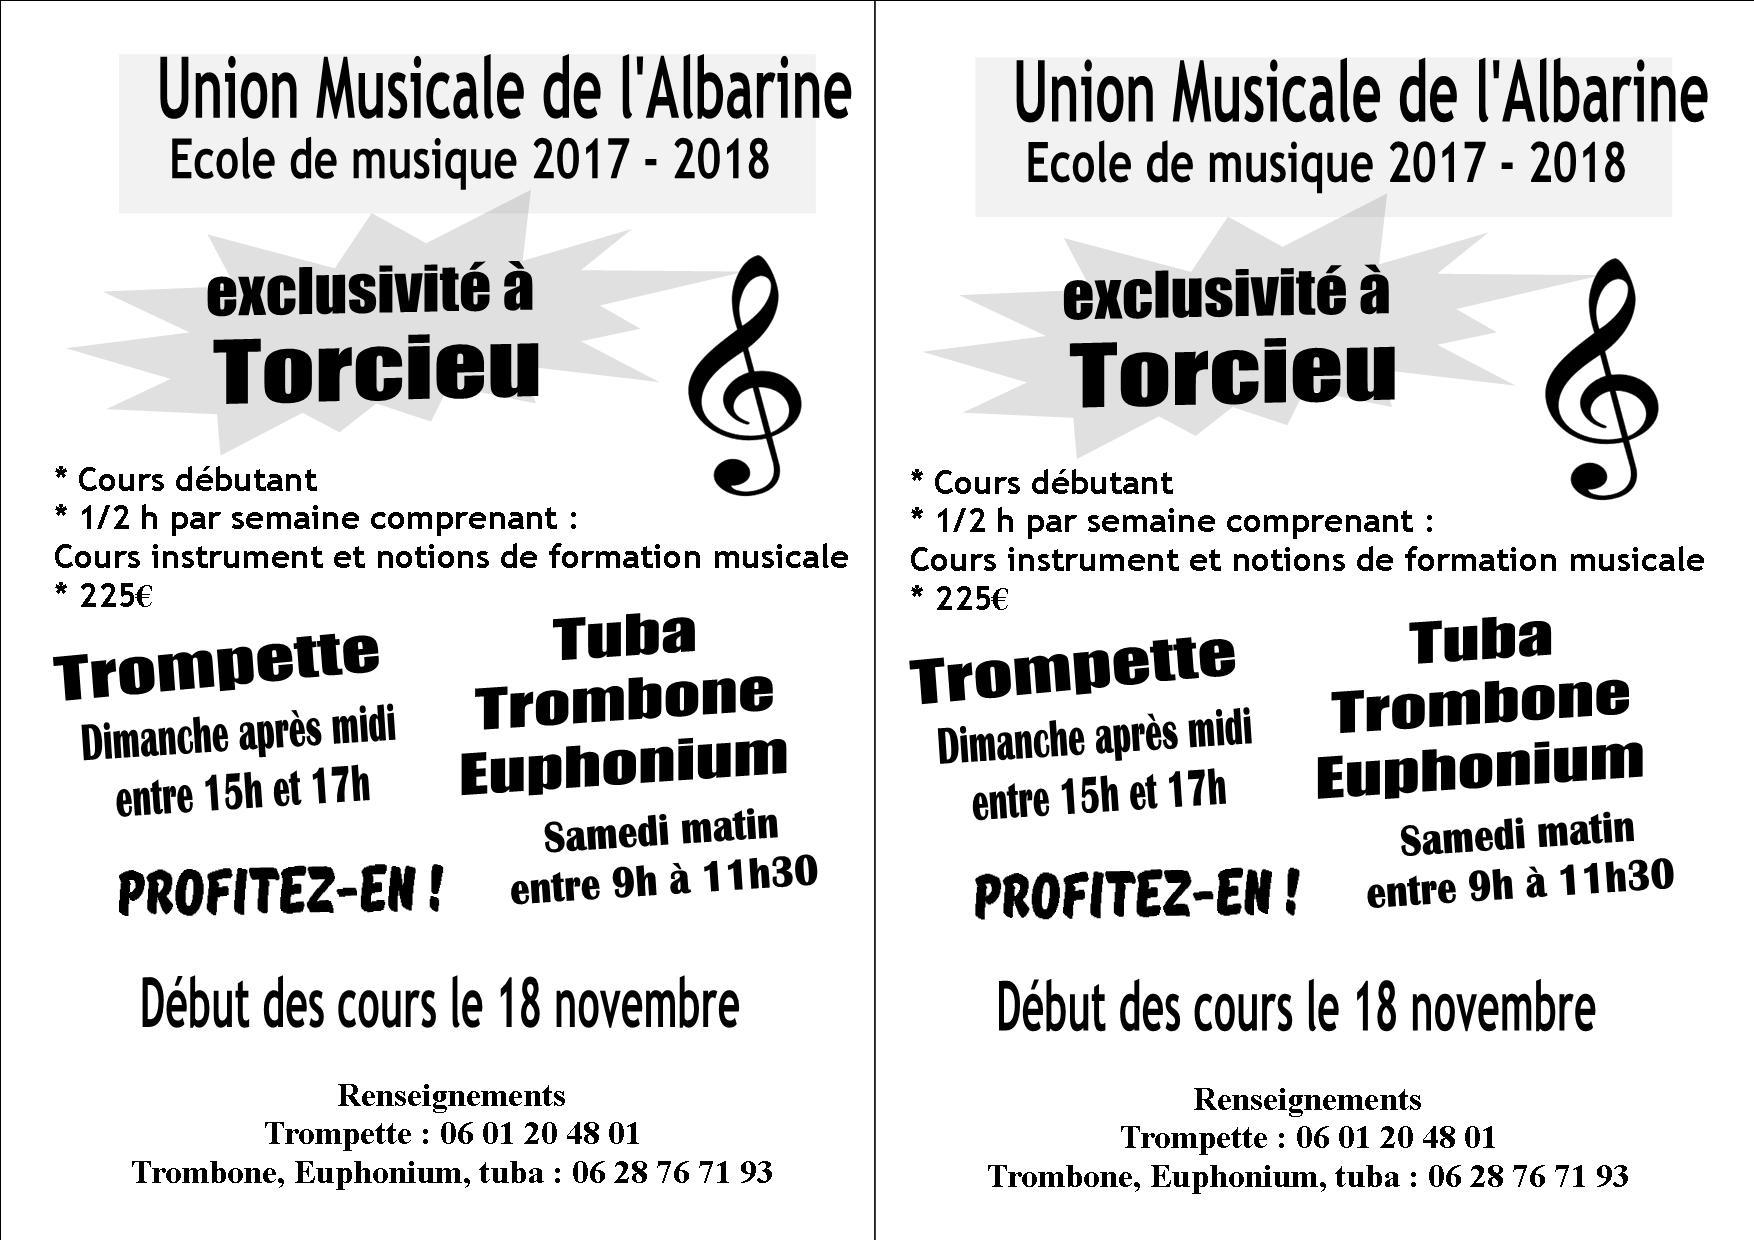 Tarifs ecole union musicale albarine torcieu debutant 2017 2018